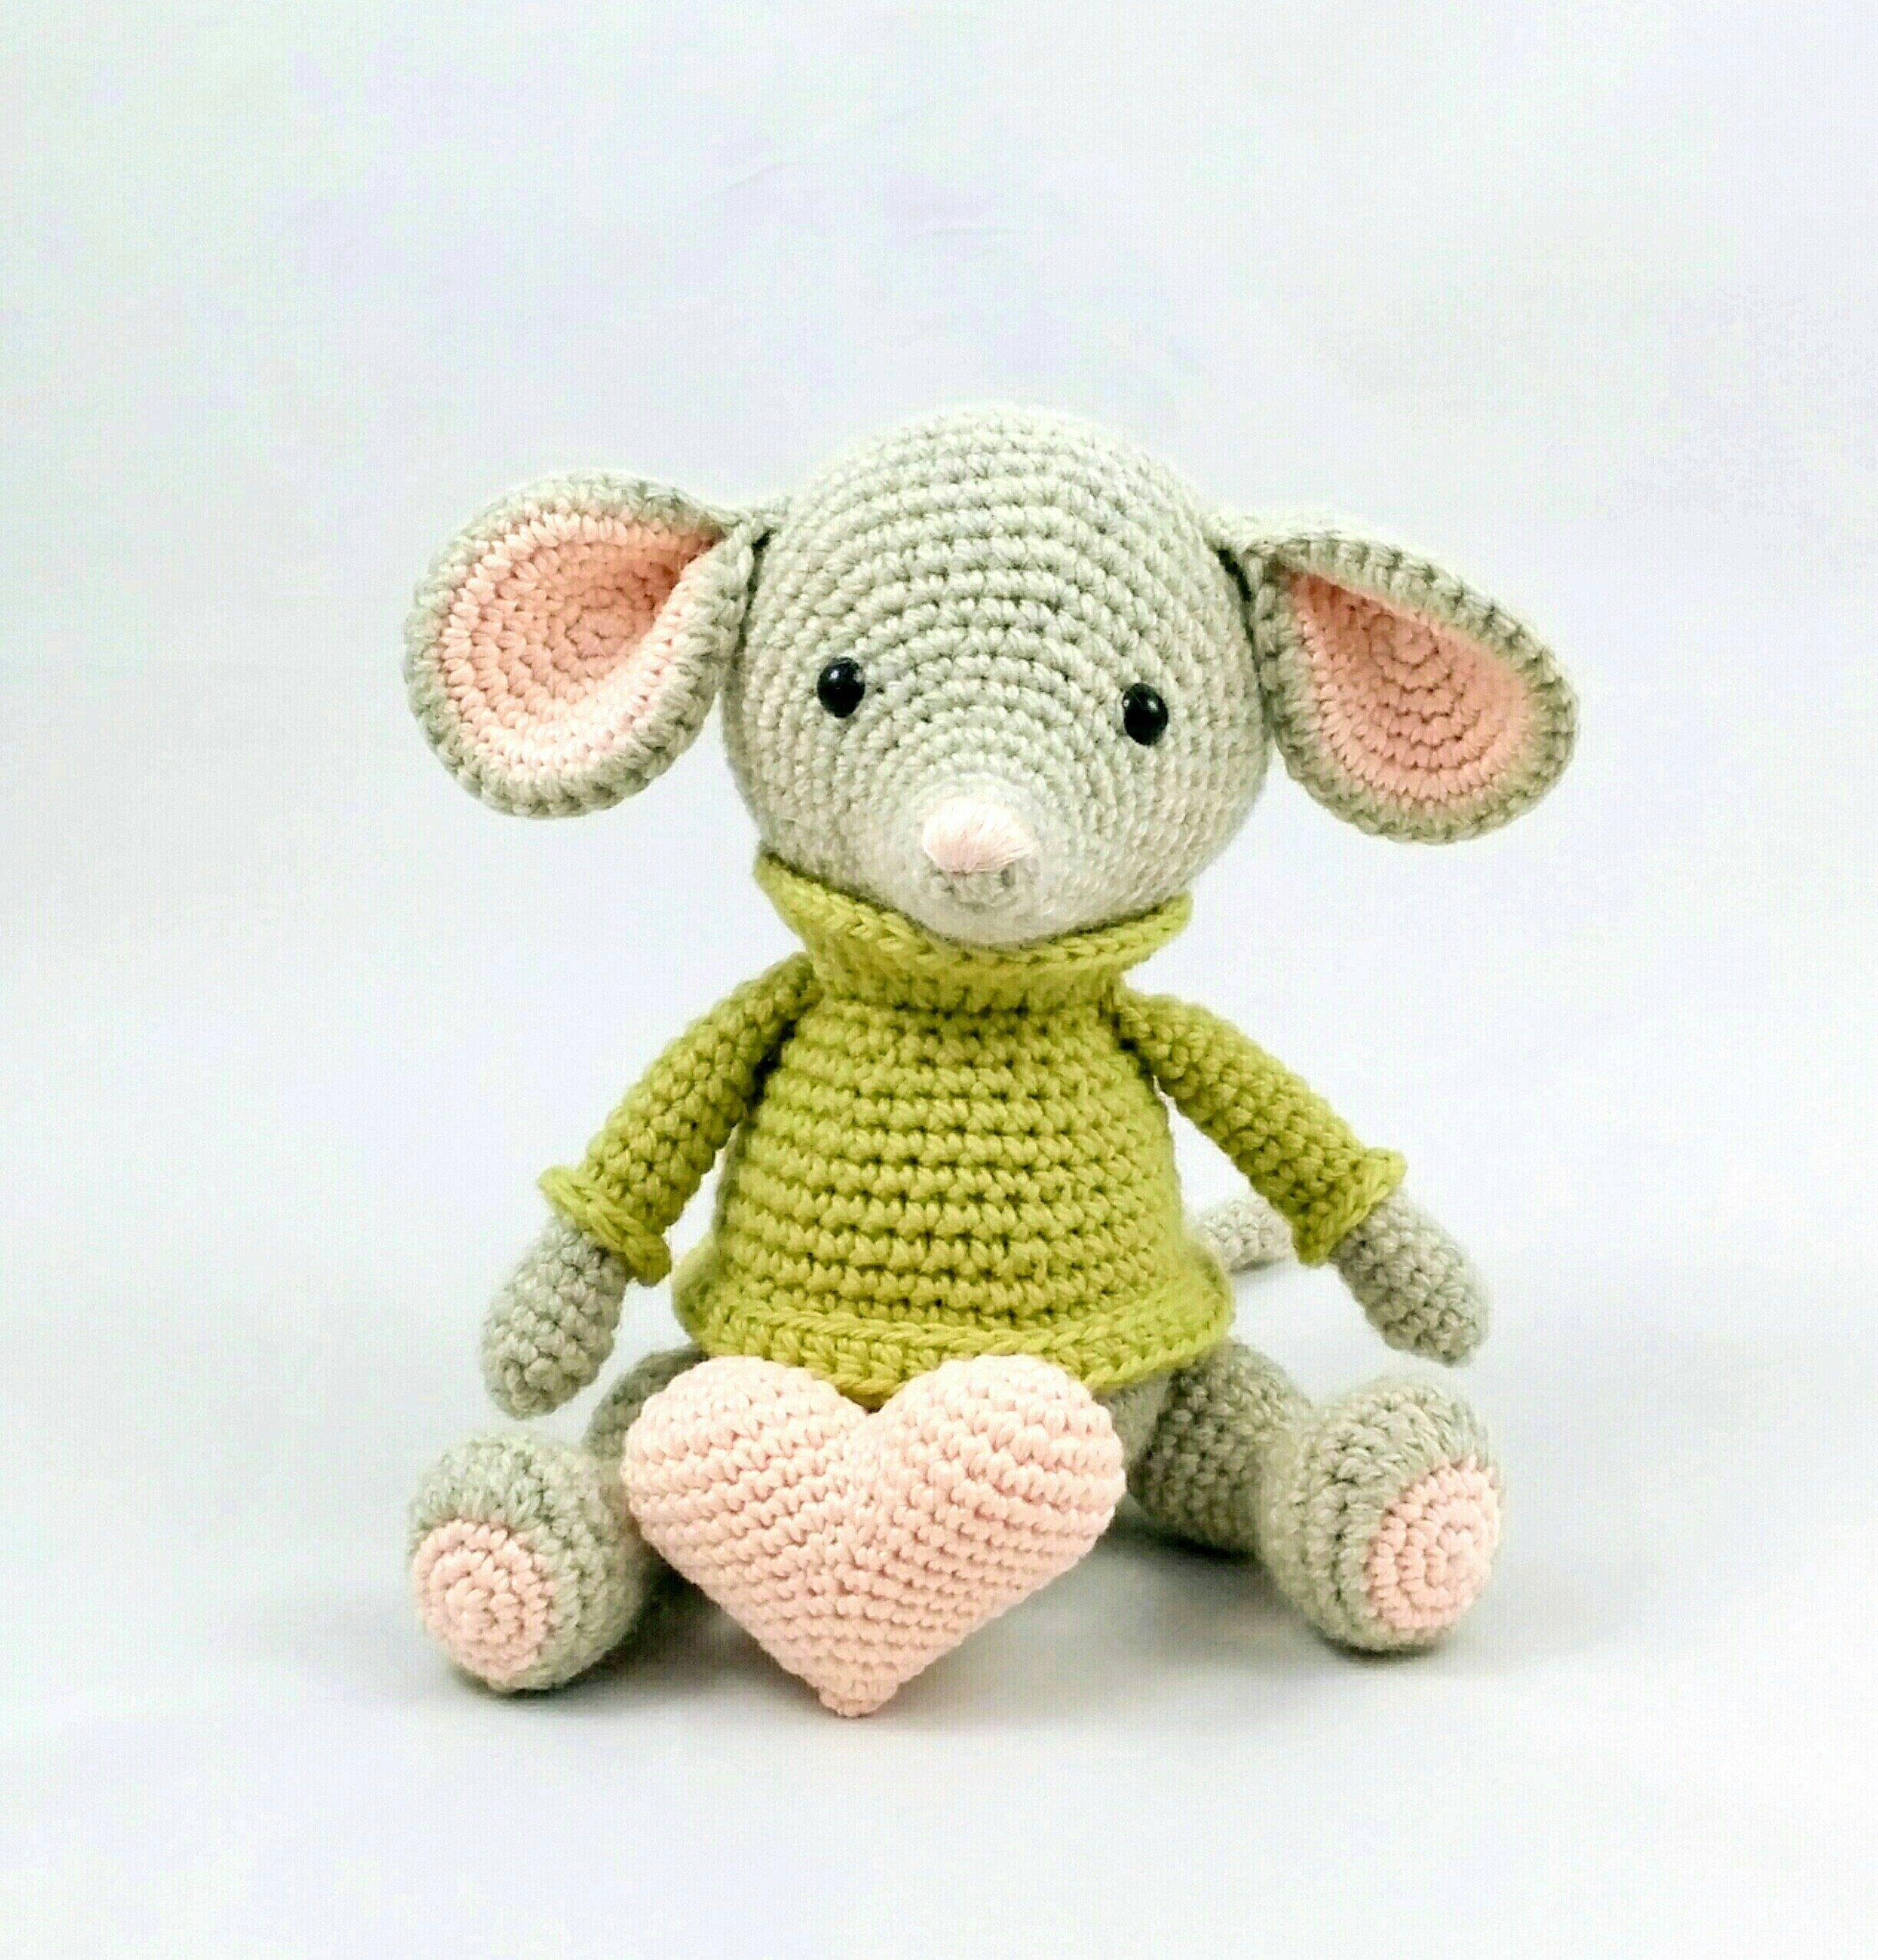 Wallpaper : handmade, awesome, crochet, Nintendo, 8bit, amigurumi ... | 2555x2448